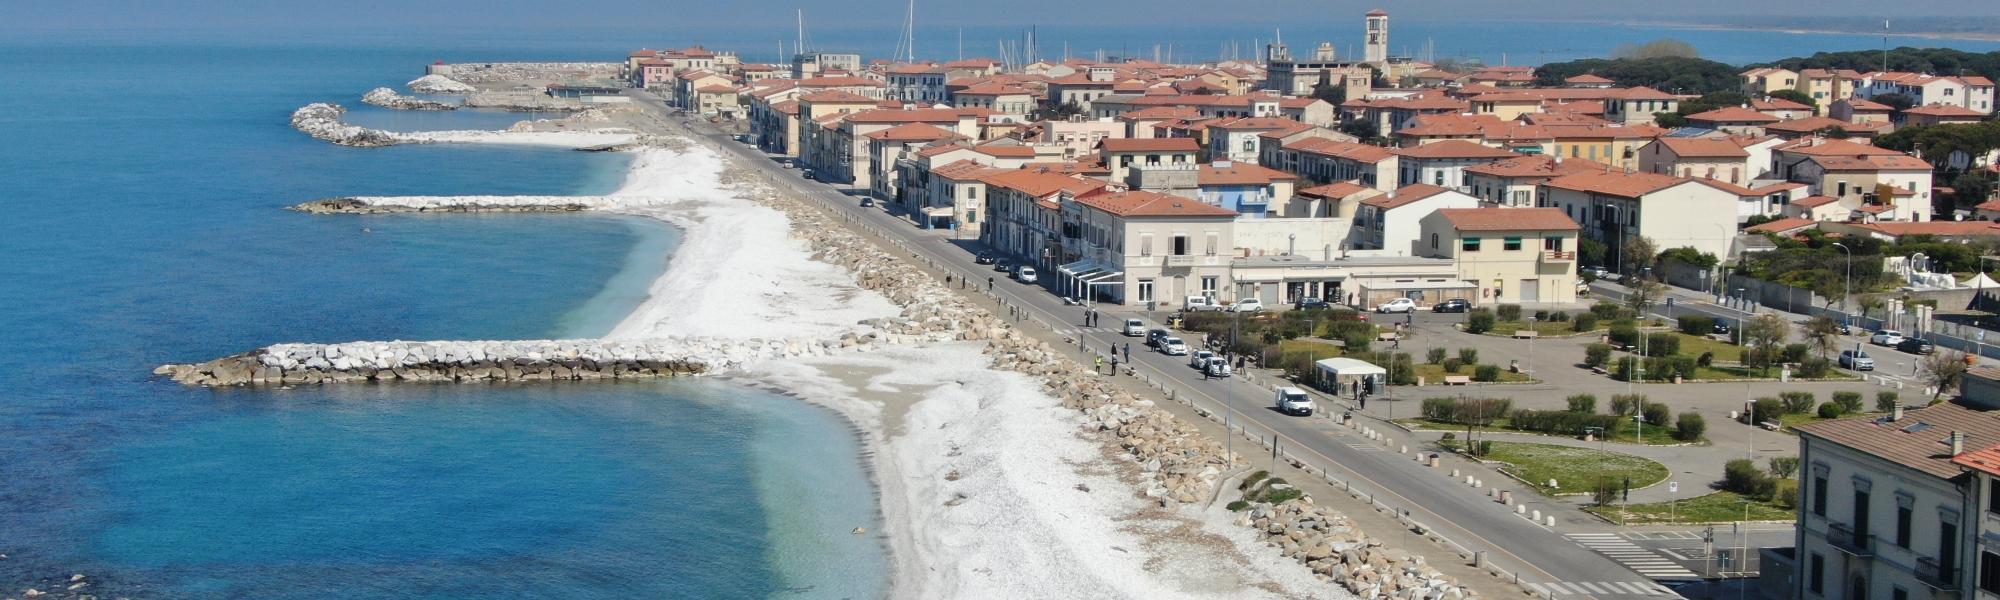 Veduta aerea Marina di Pisa, spiagge di sassi bianchi - foto con drone ( M. Boi, Comune di Pisa)